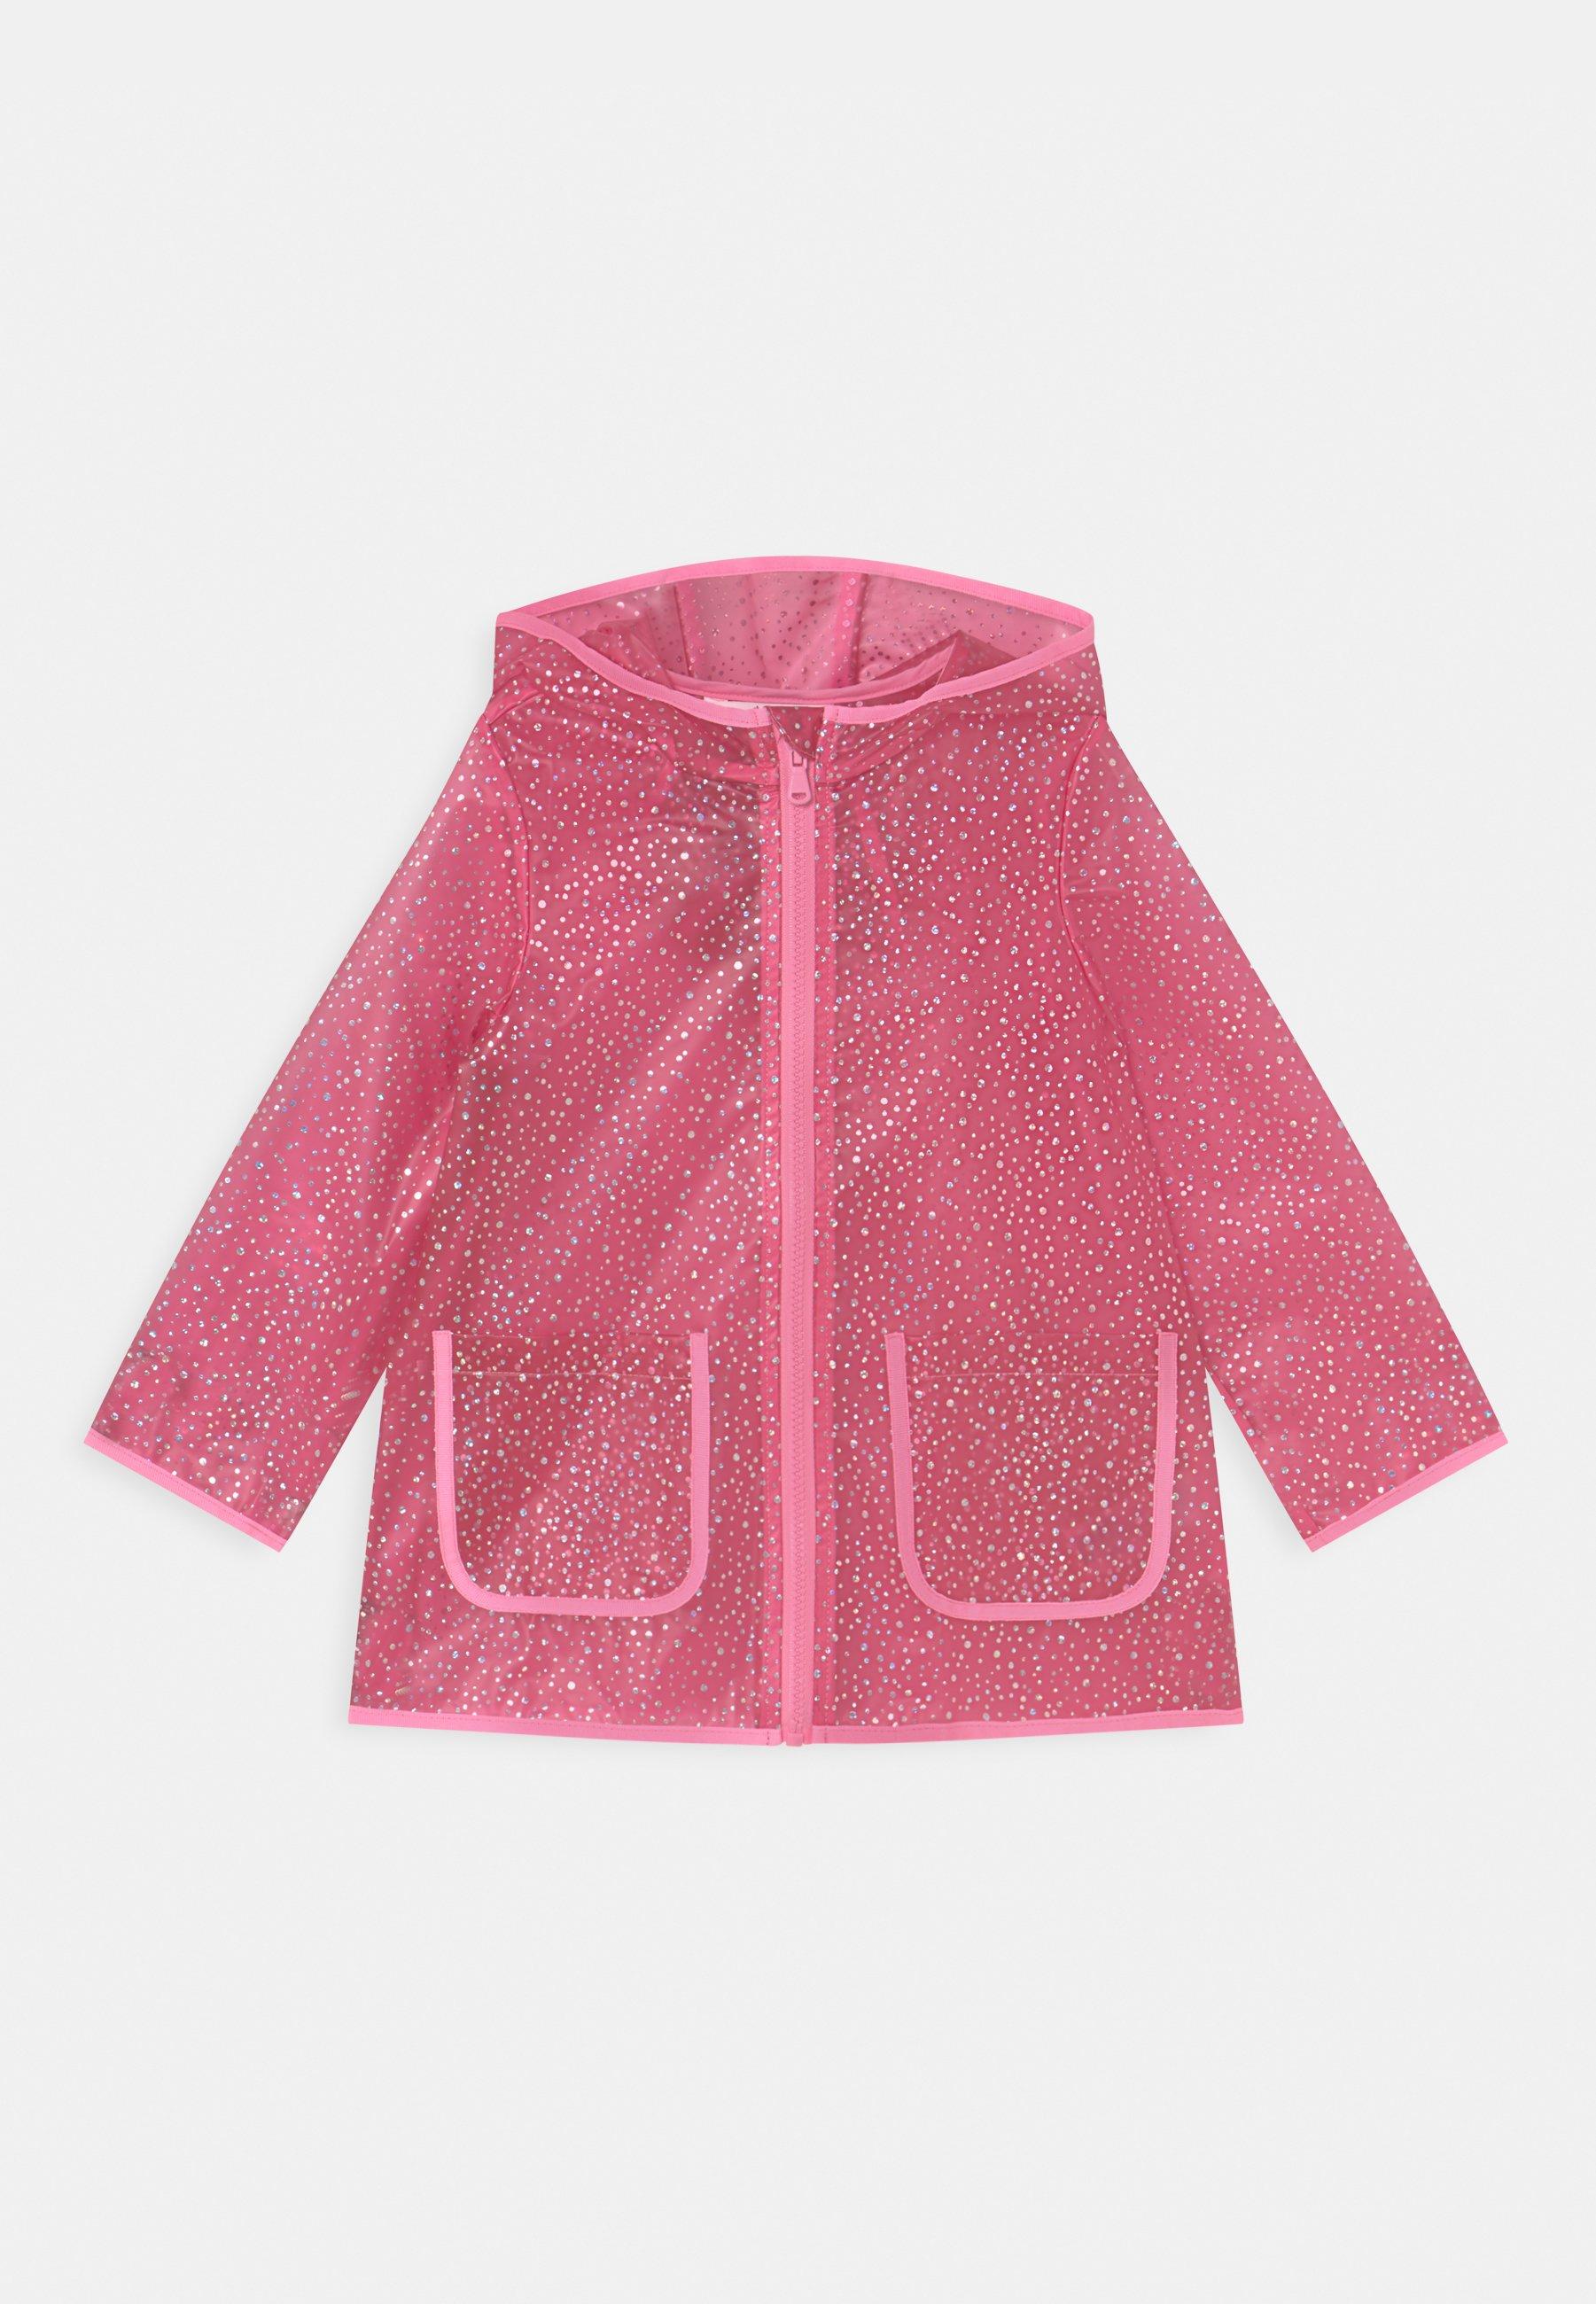 Kinder RAINBOW  - Regenjacke / wasserabweisende Jacke